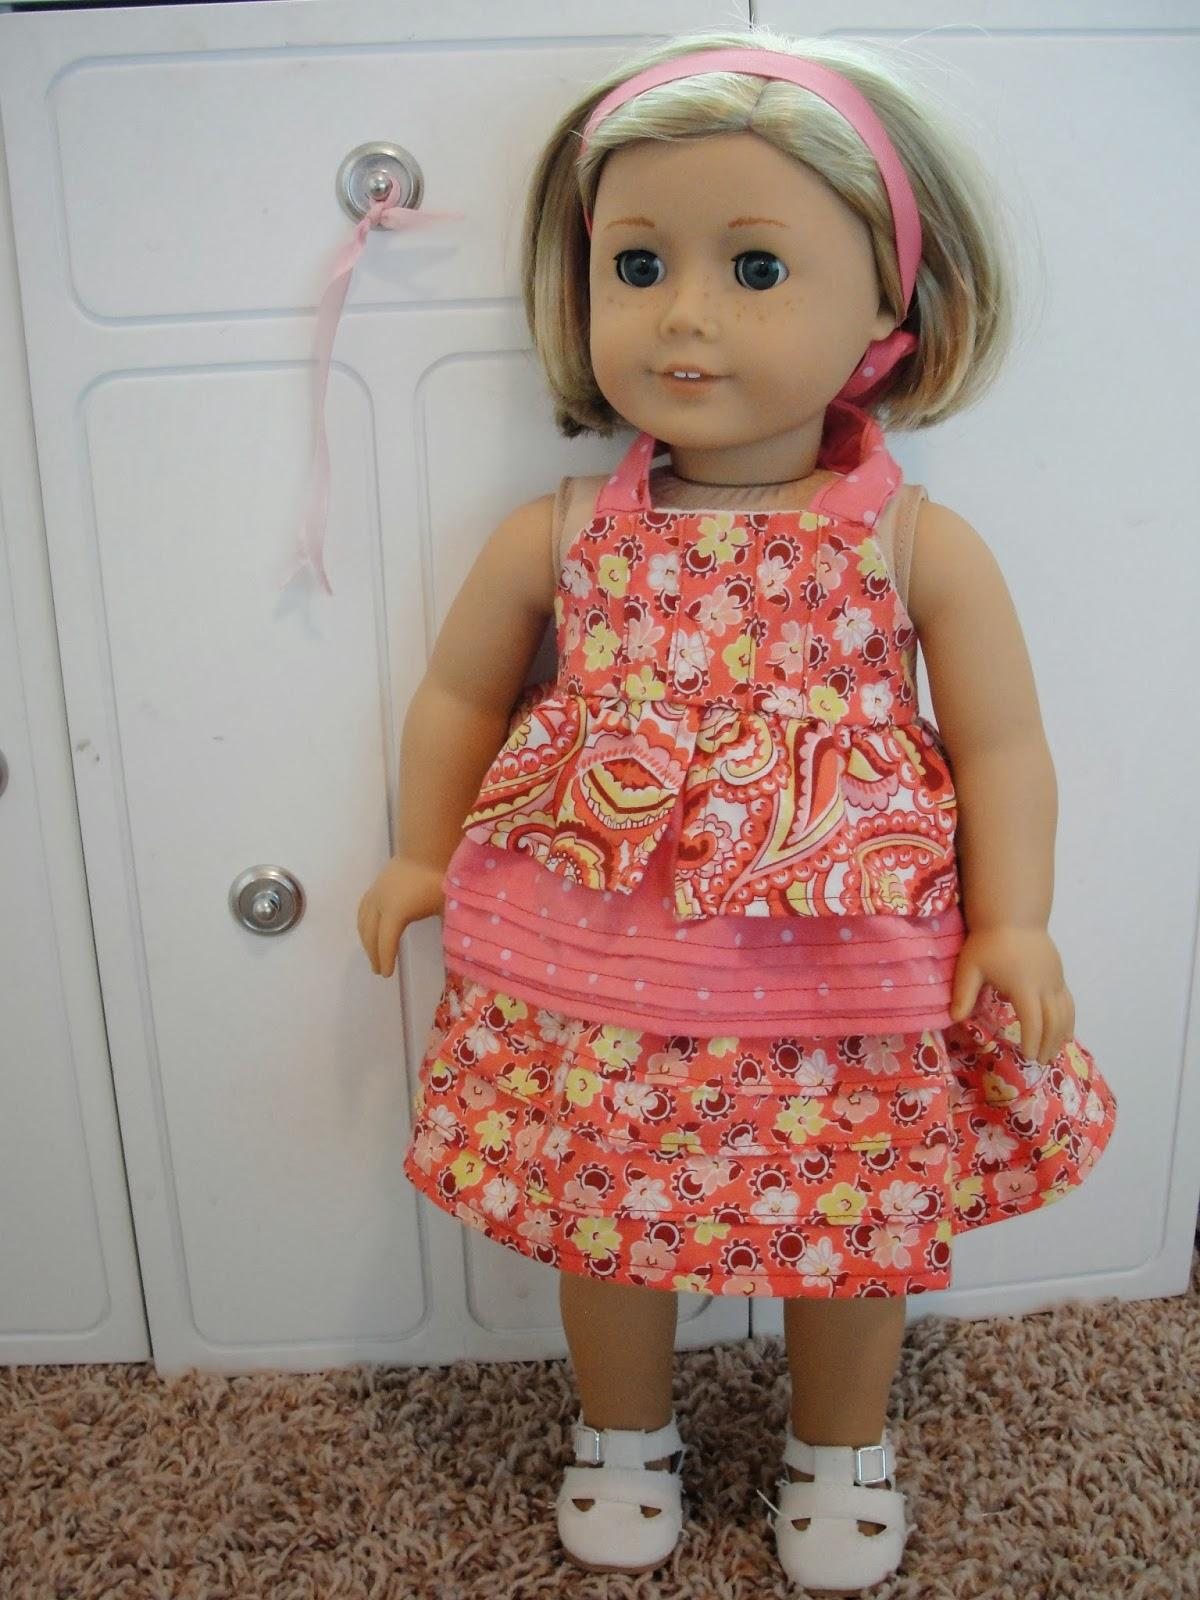 http://thetiptoefairy.com/blog/2014/03/american-girl-doll-blog-hop.html